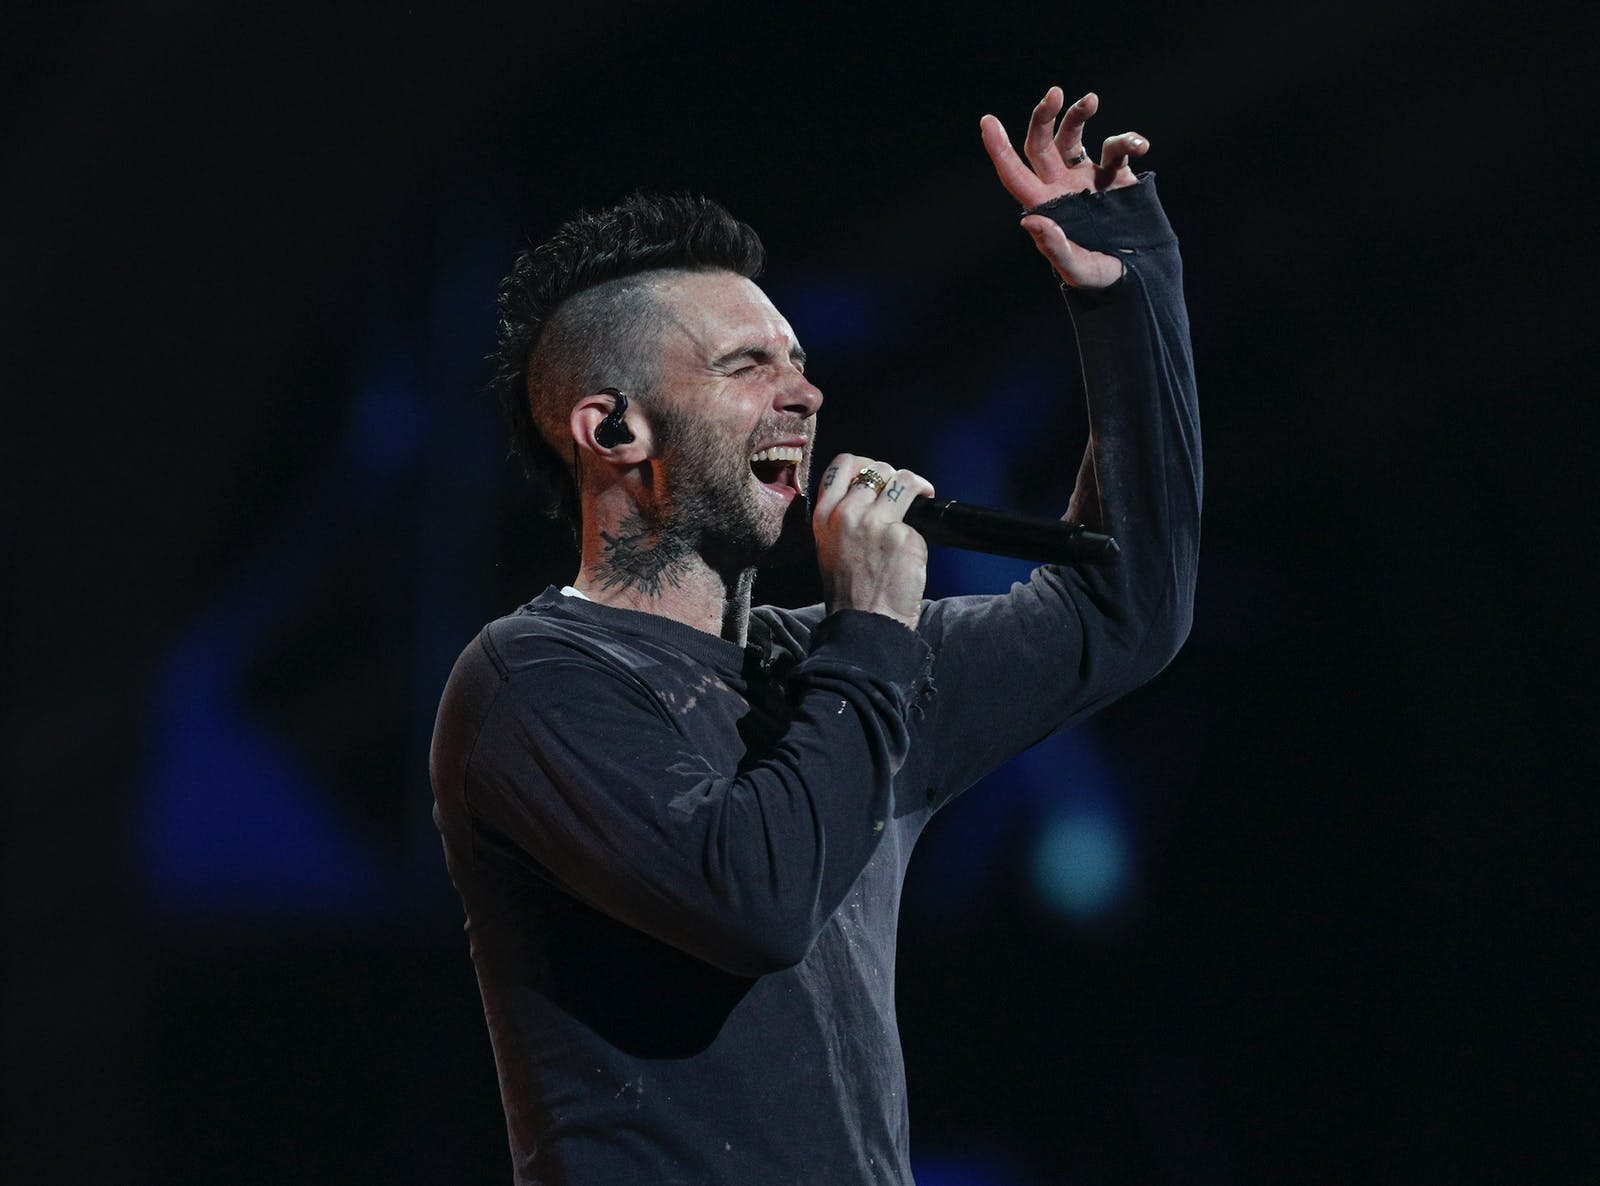 Maroon 5 performs on Feb. 27, 2020. Photo: AP